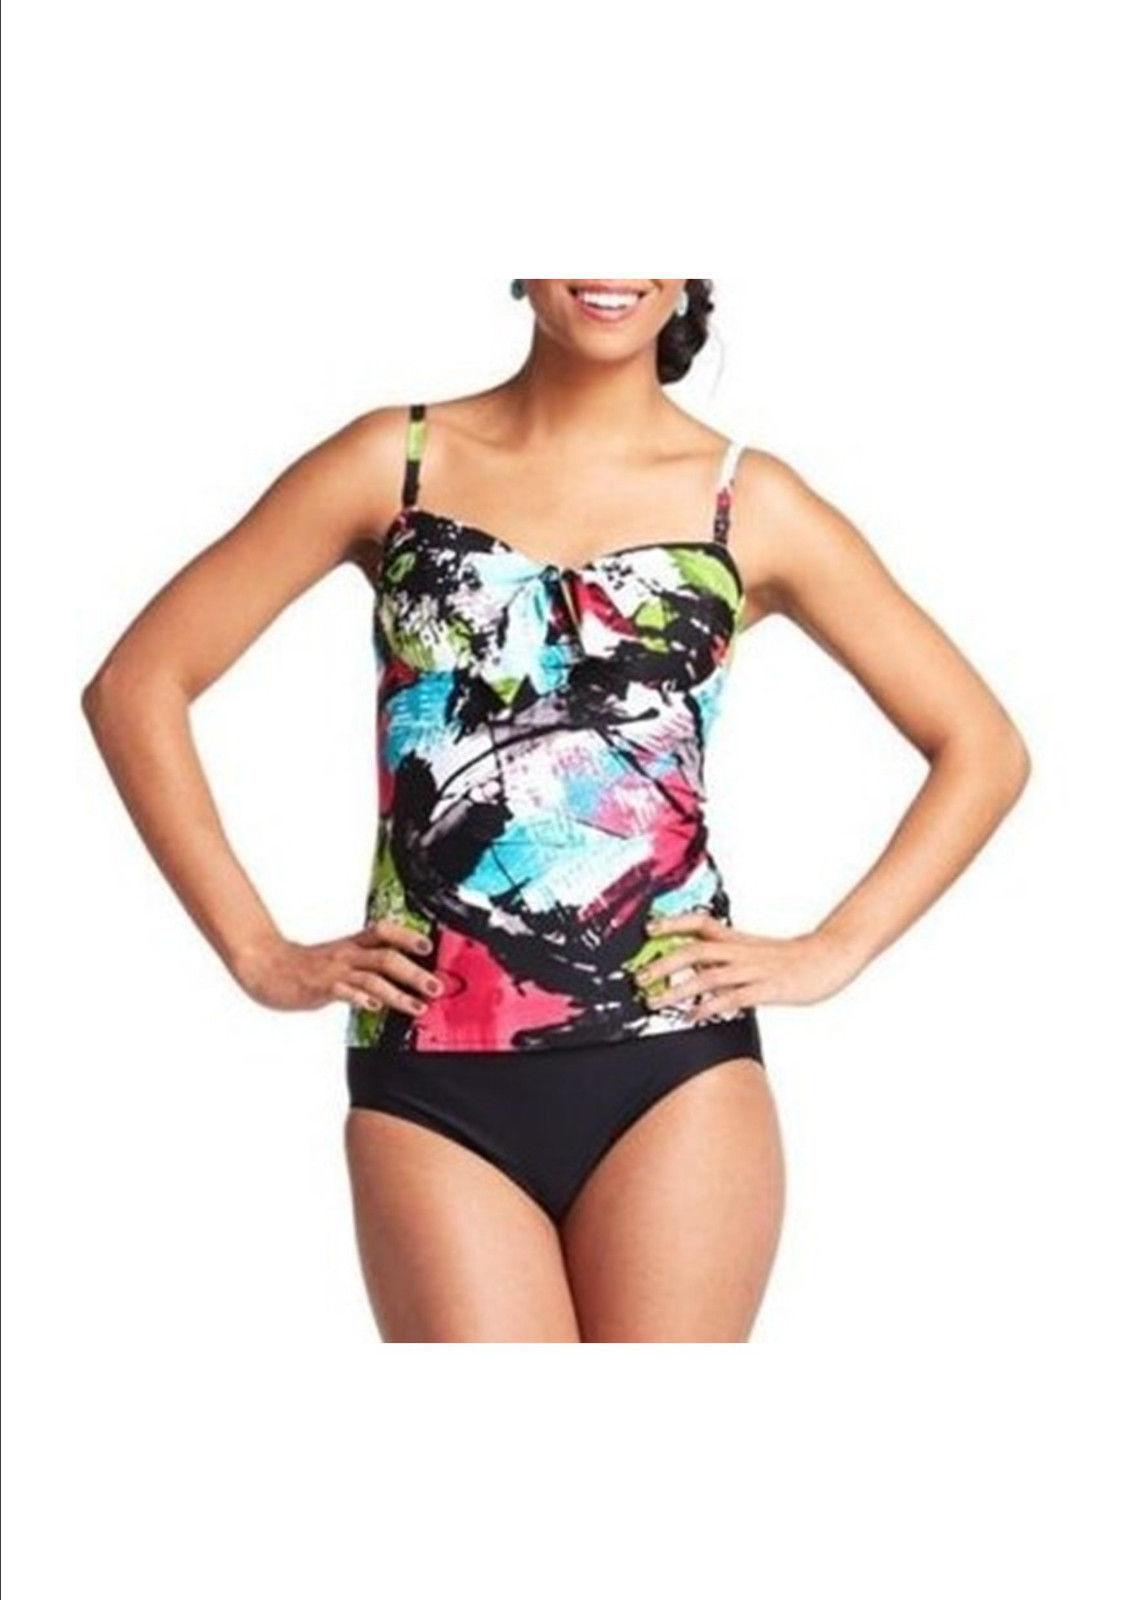 83f34c5bcf631 S l1600. S l1600. Previous. Croft   Barrow Swim Underwire bust Enhancer Tankini  Top Floral Black Multi Sz 6